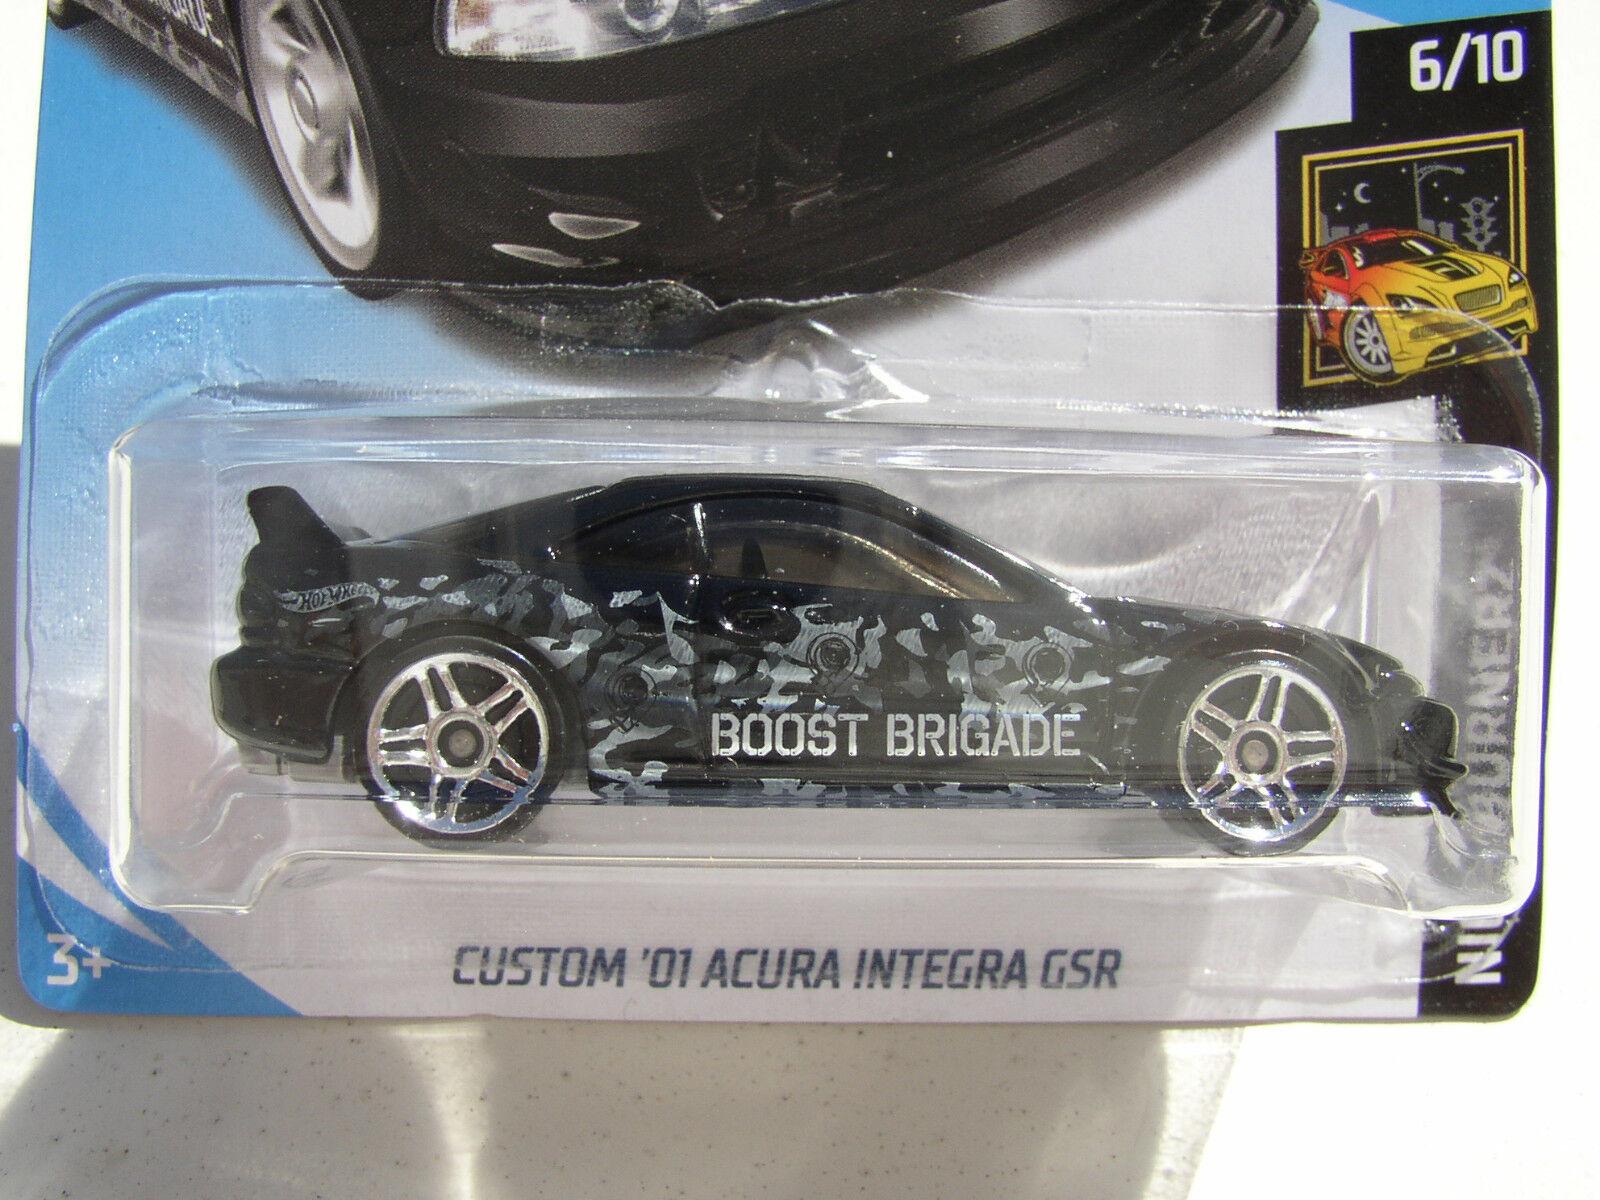 Hot Wheels 2018 Kmart K Day Black Custom 01 Acura Integra Gsr Nightburnerz 6 10 Ebay